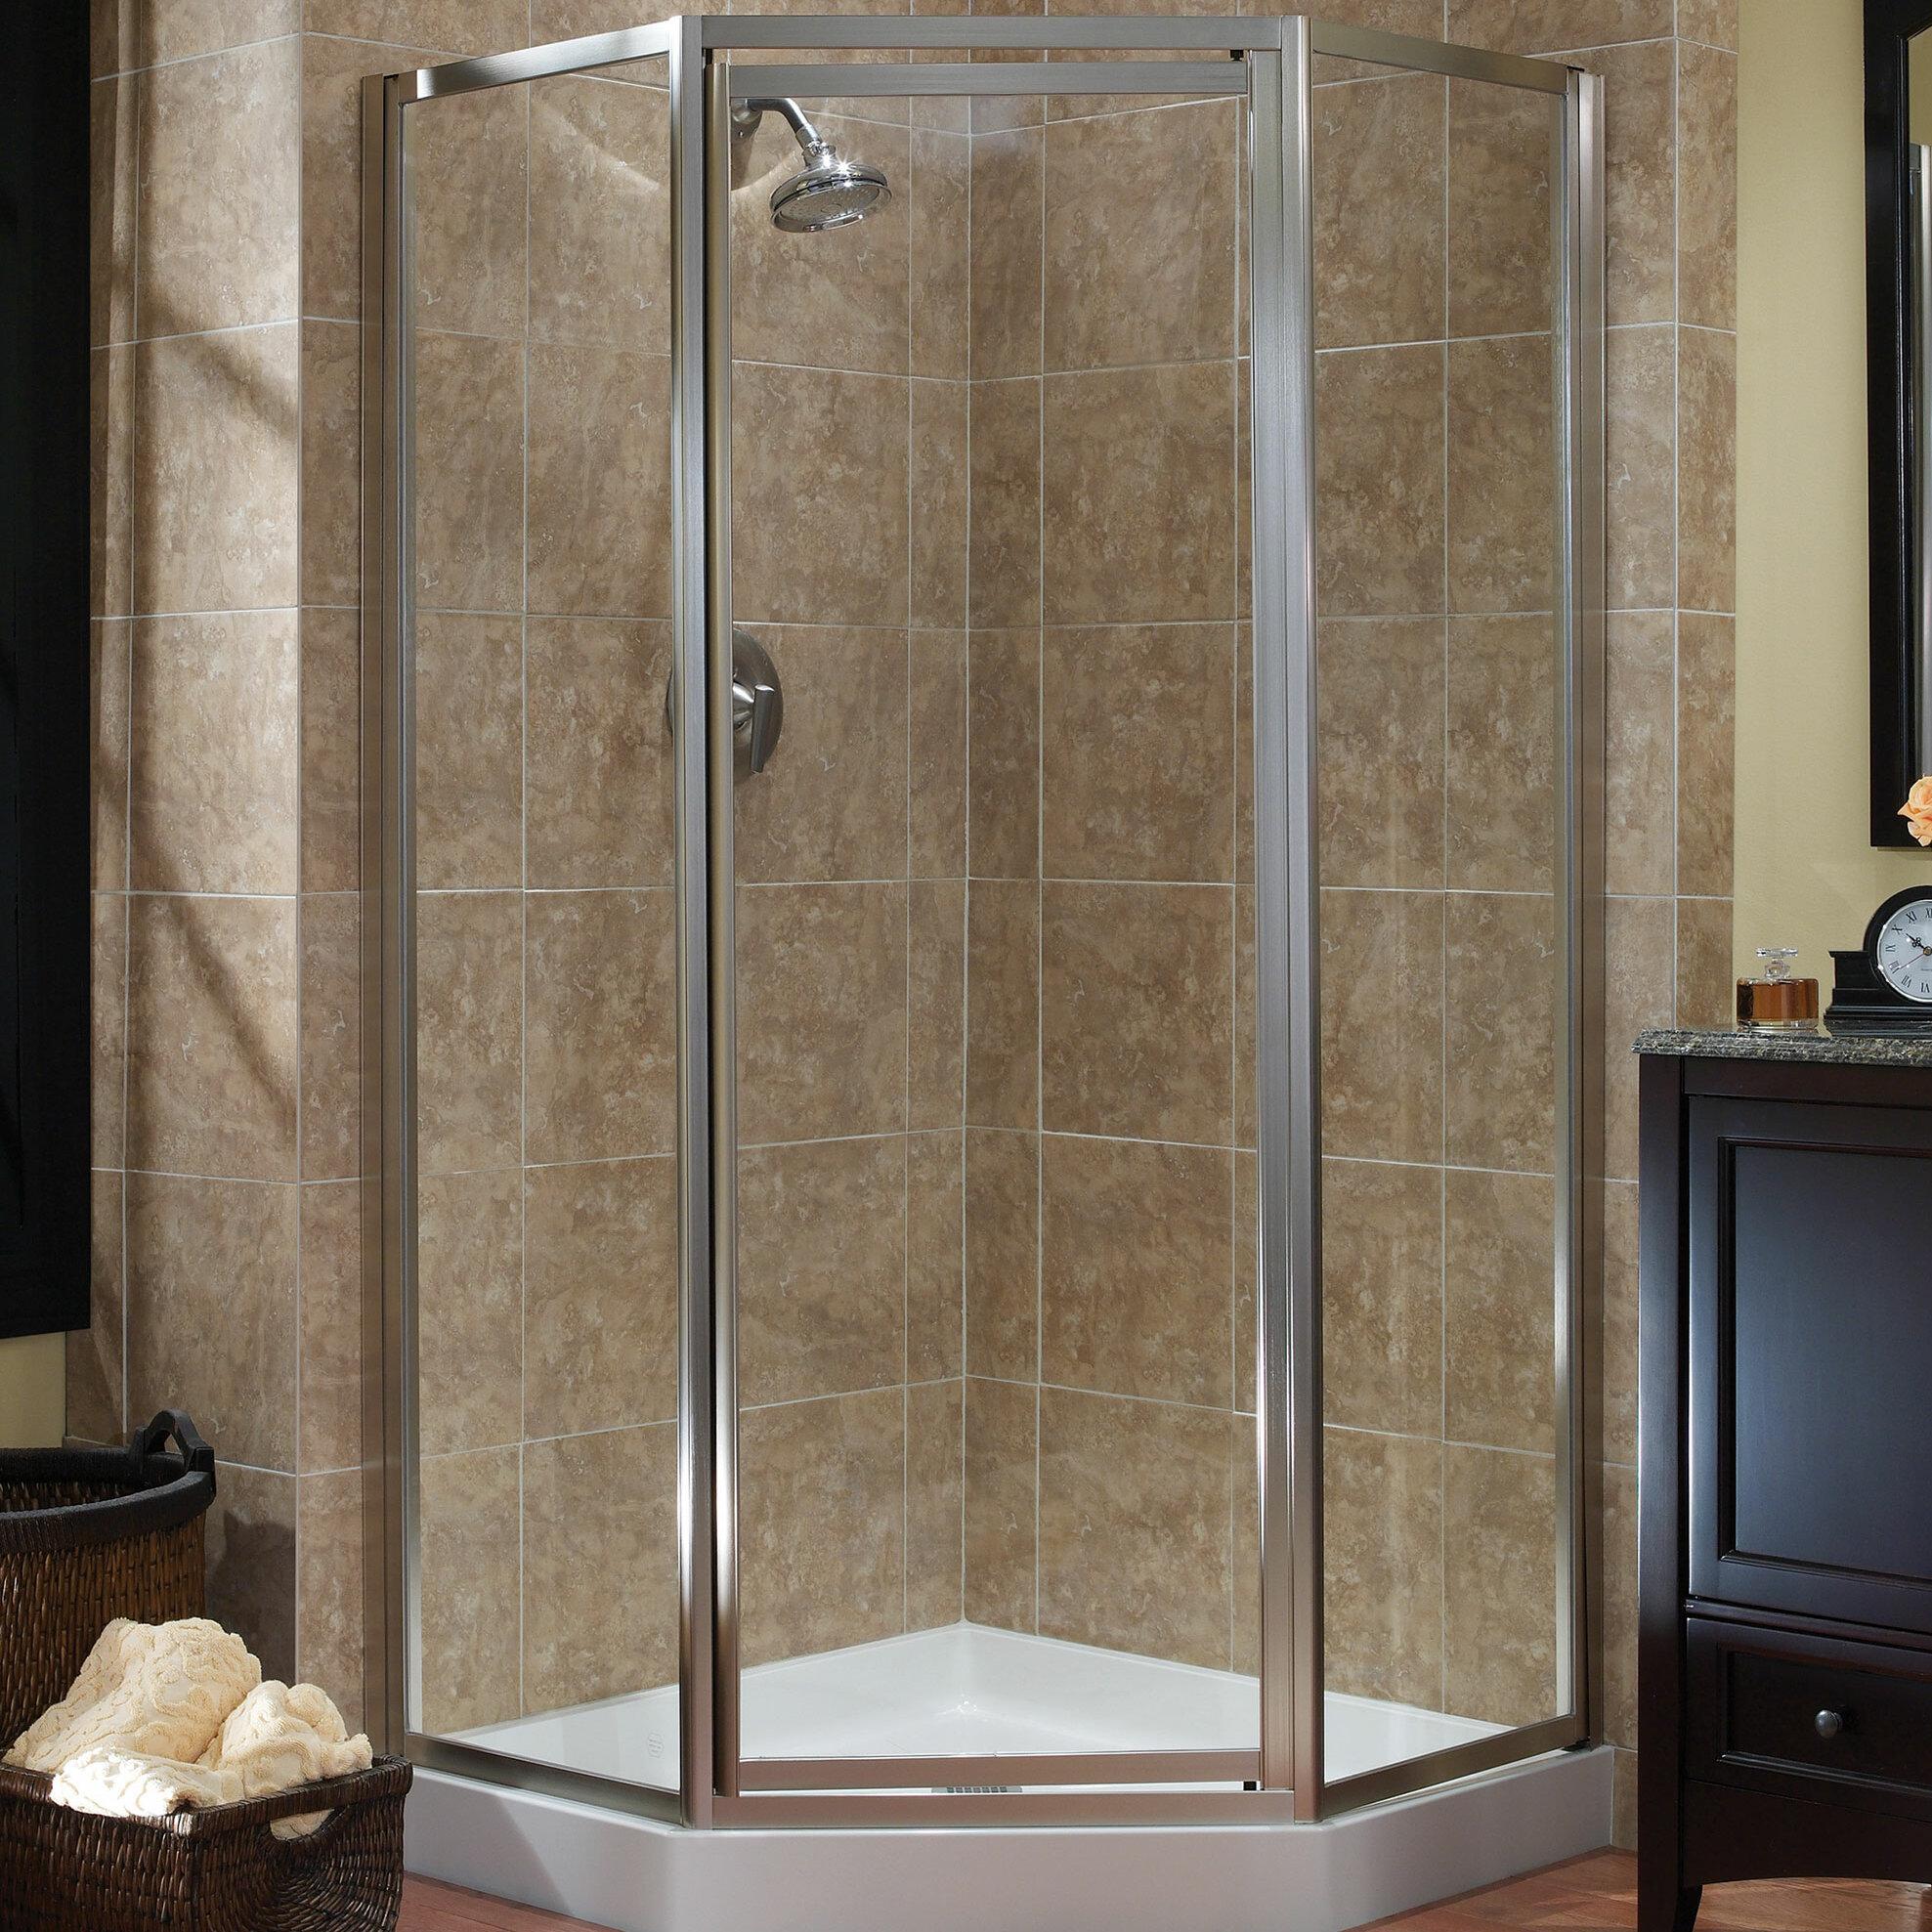 shower tray l corner square enclosures medium plumbing pearlstone image ventura victorian entry n with enclosure